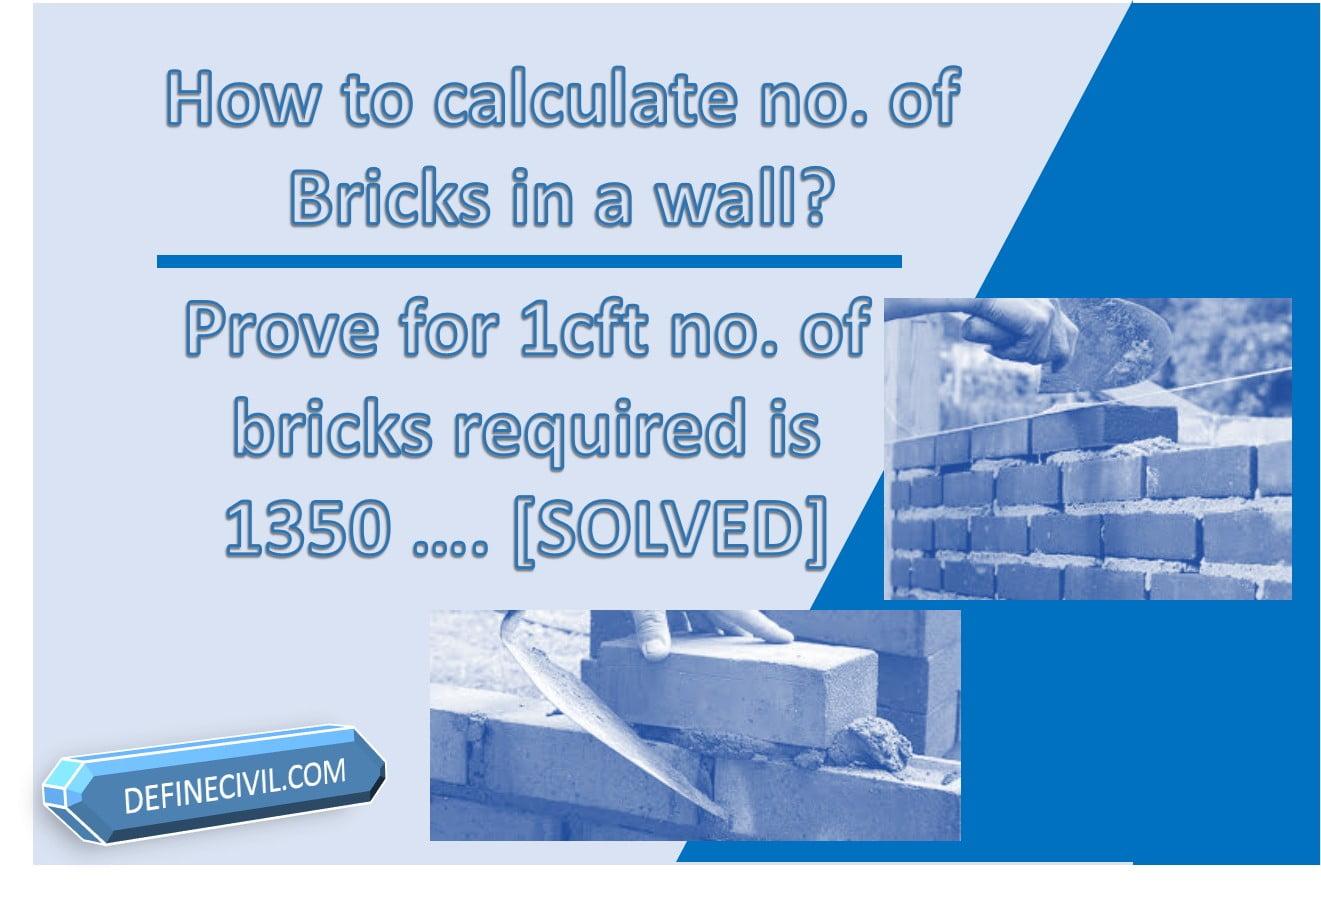 no-of-bricks-in-1-cft